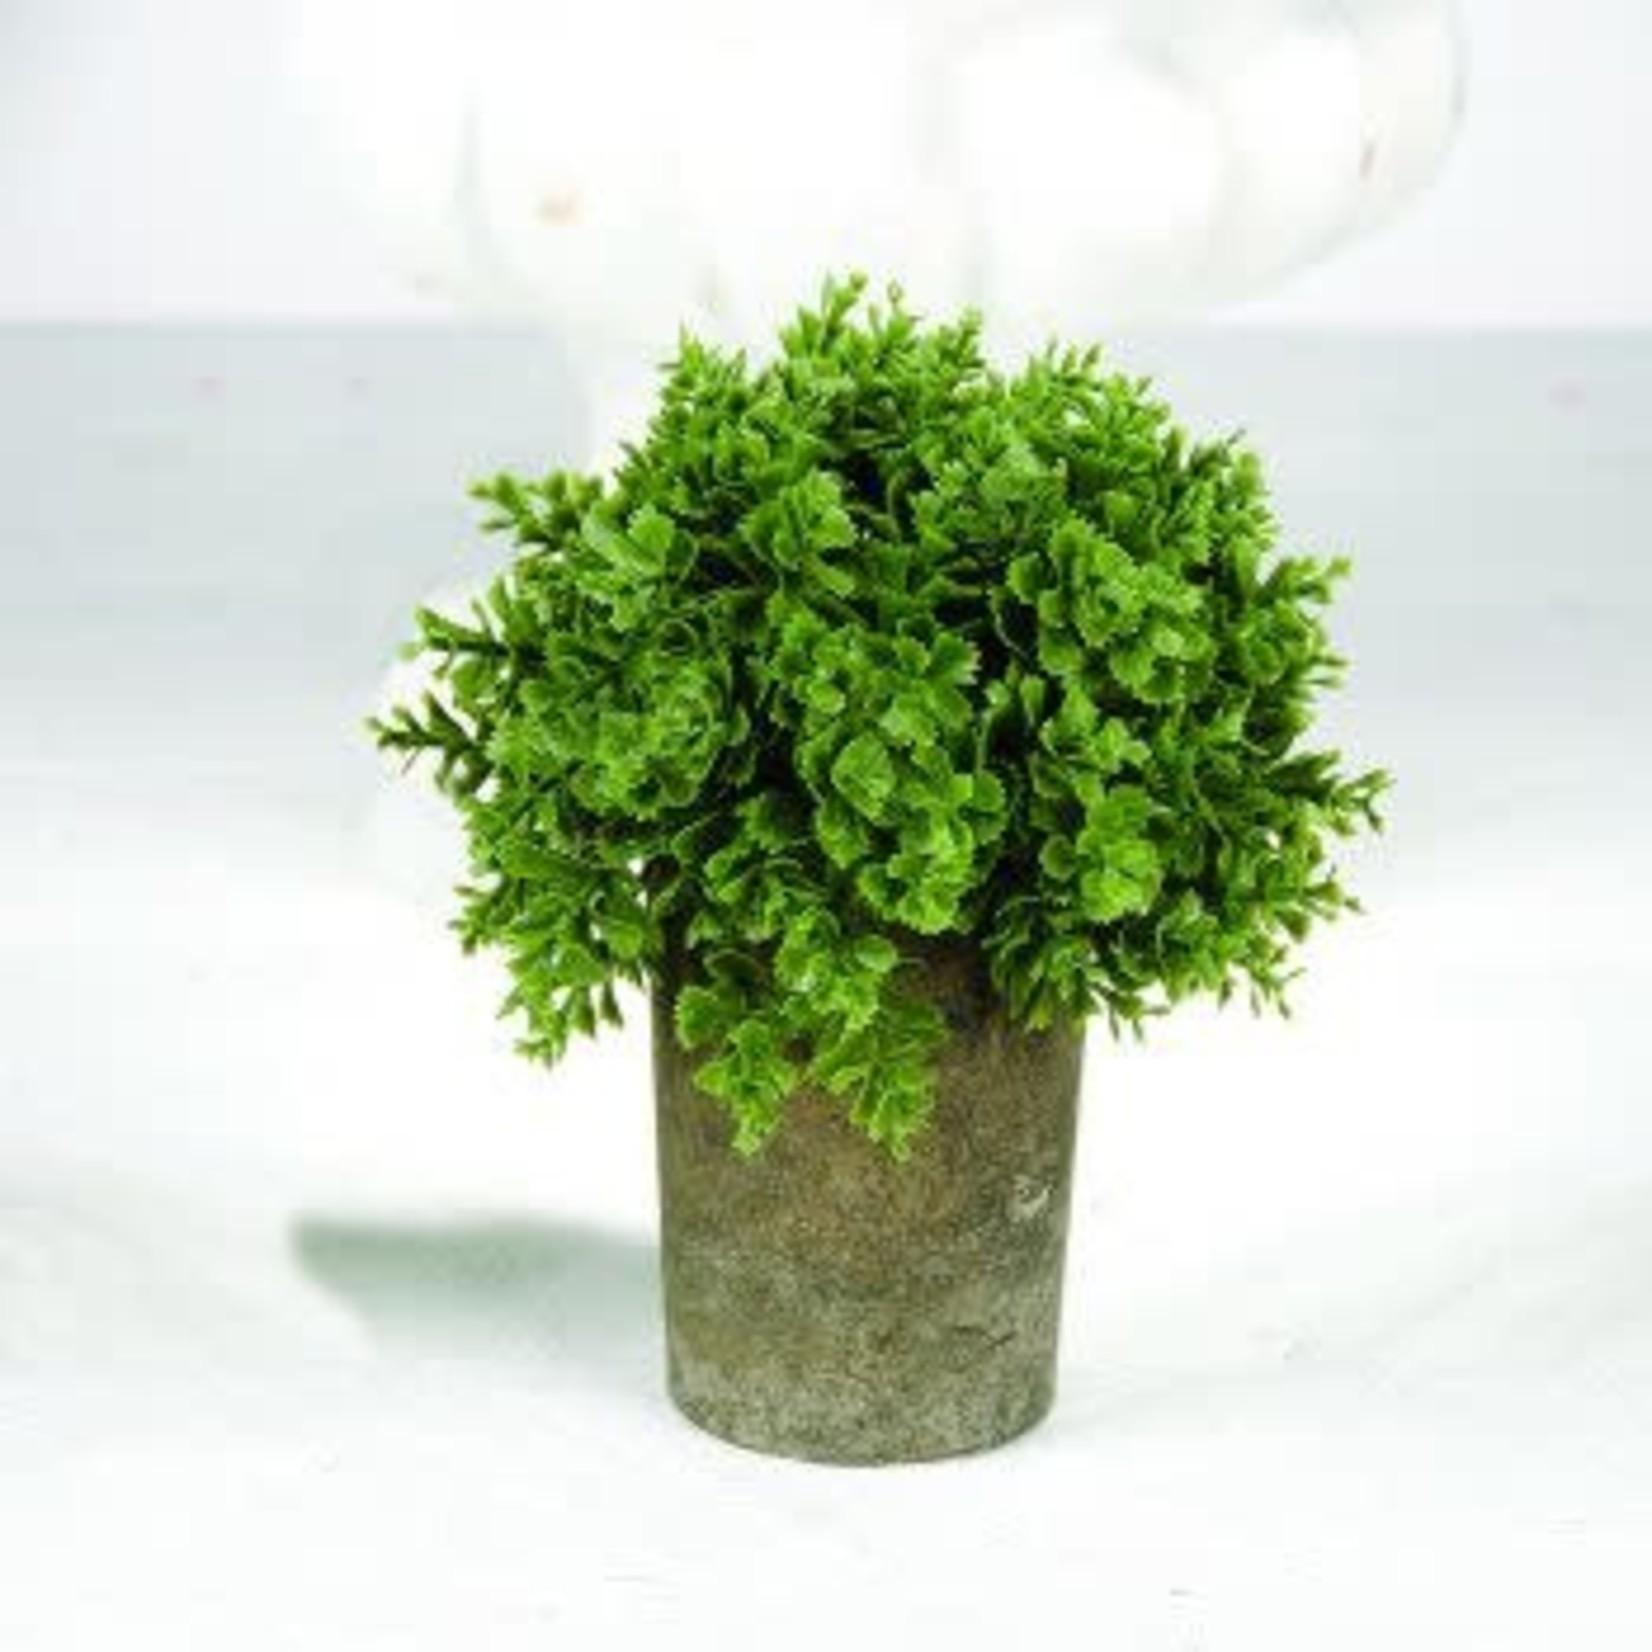 Round Succulent In Skinny Grey Pot